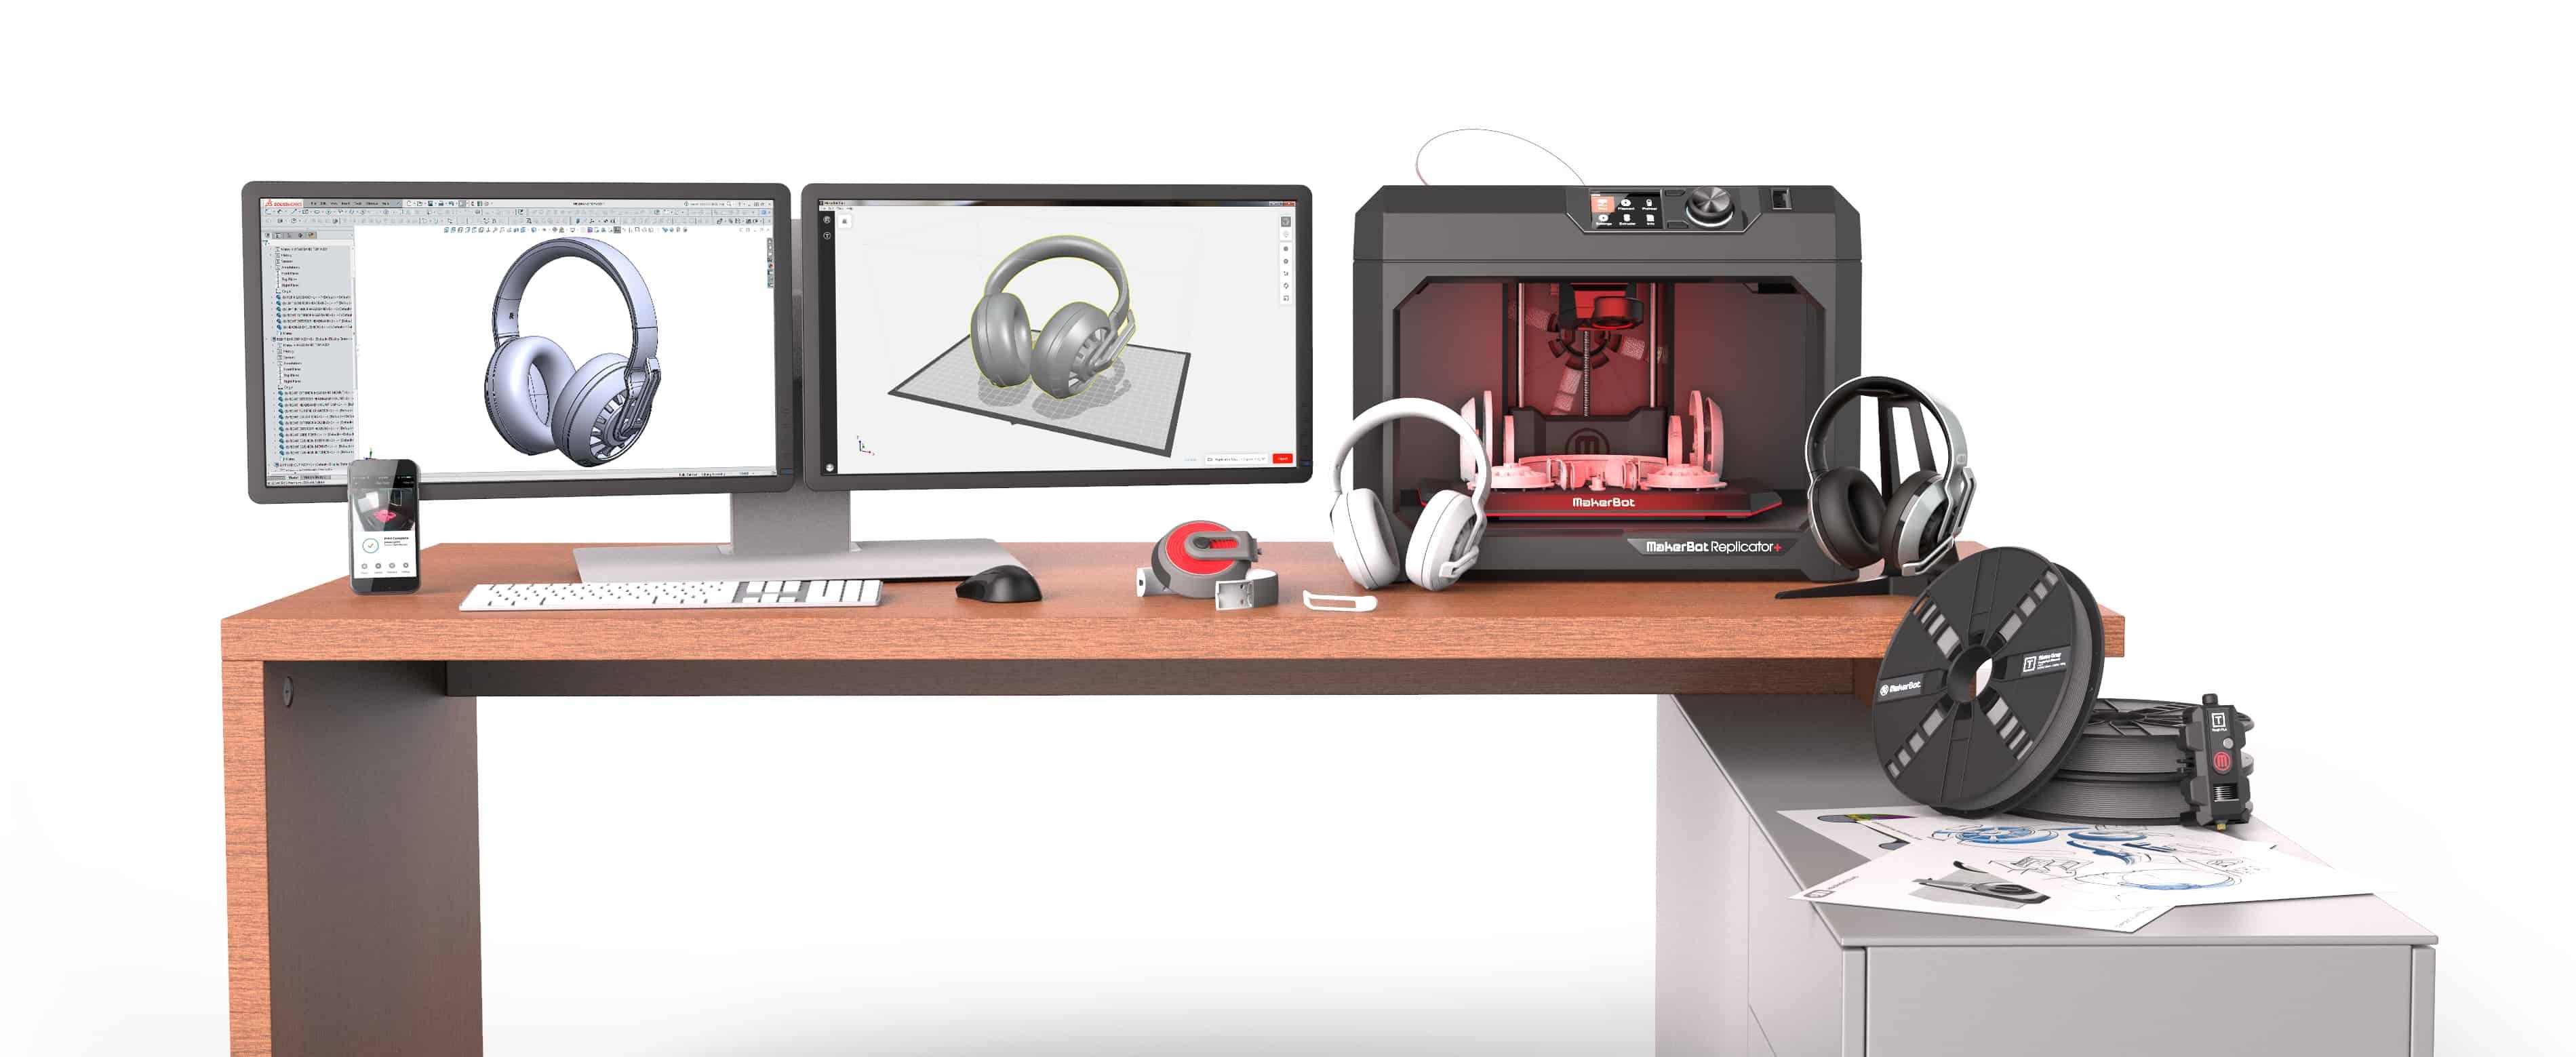 MakerBot_ipari_megoldások